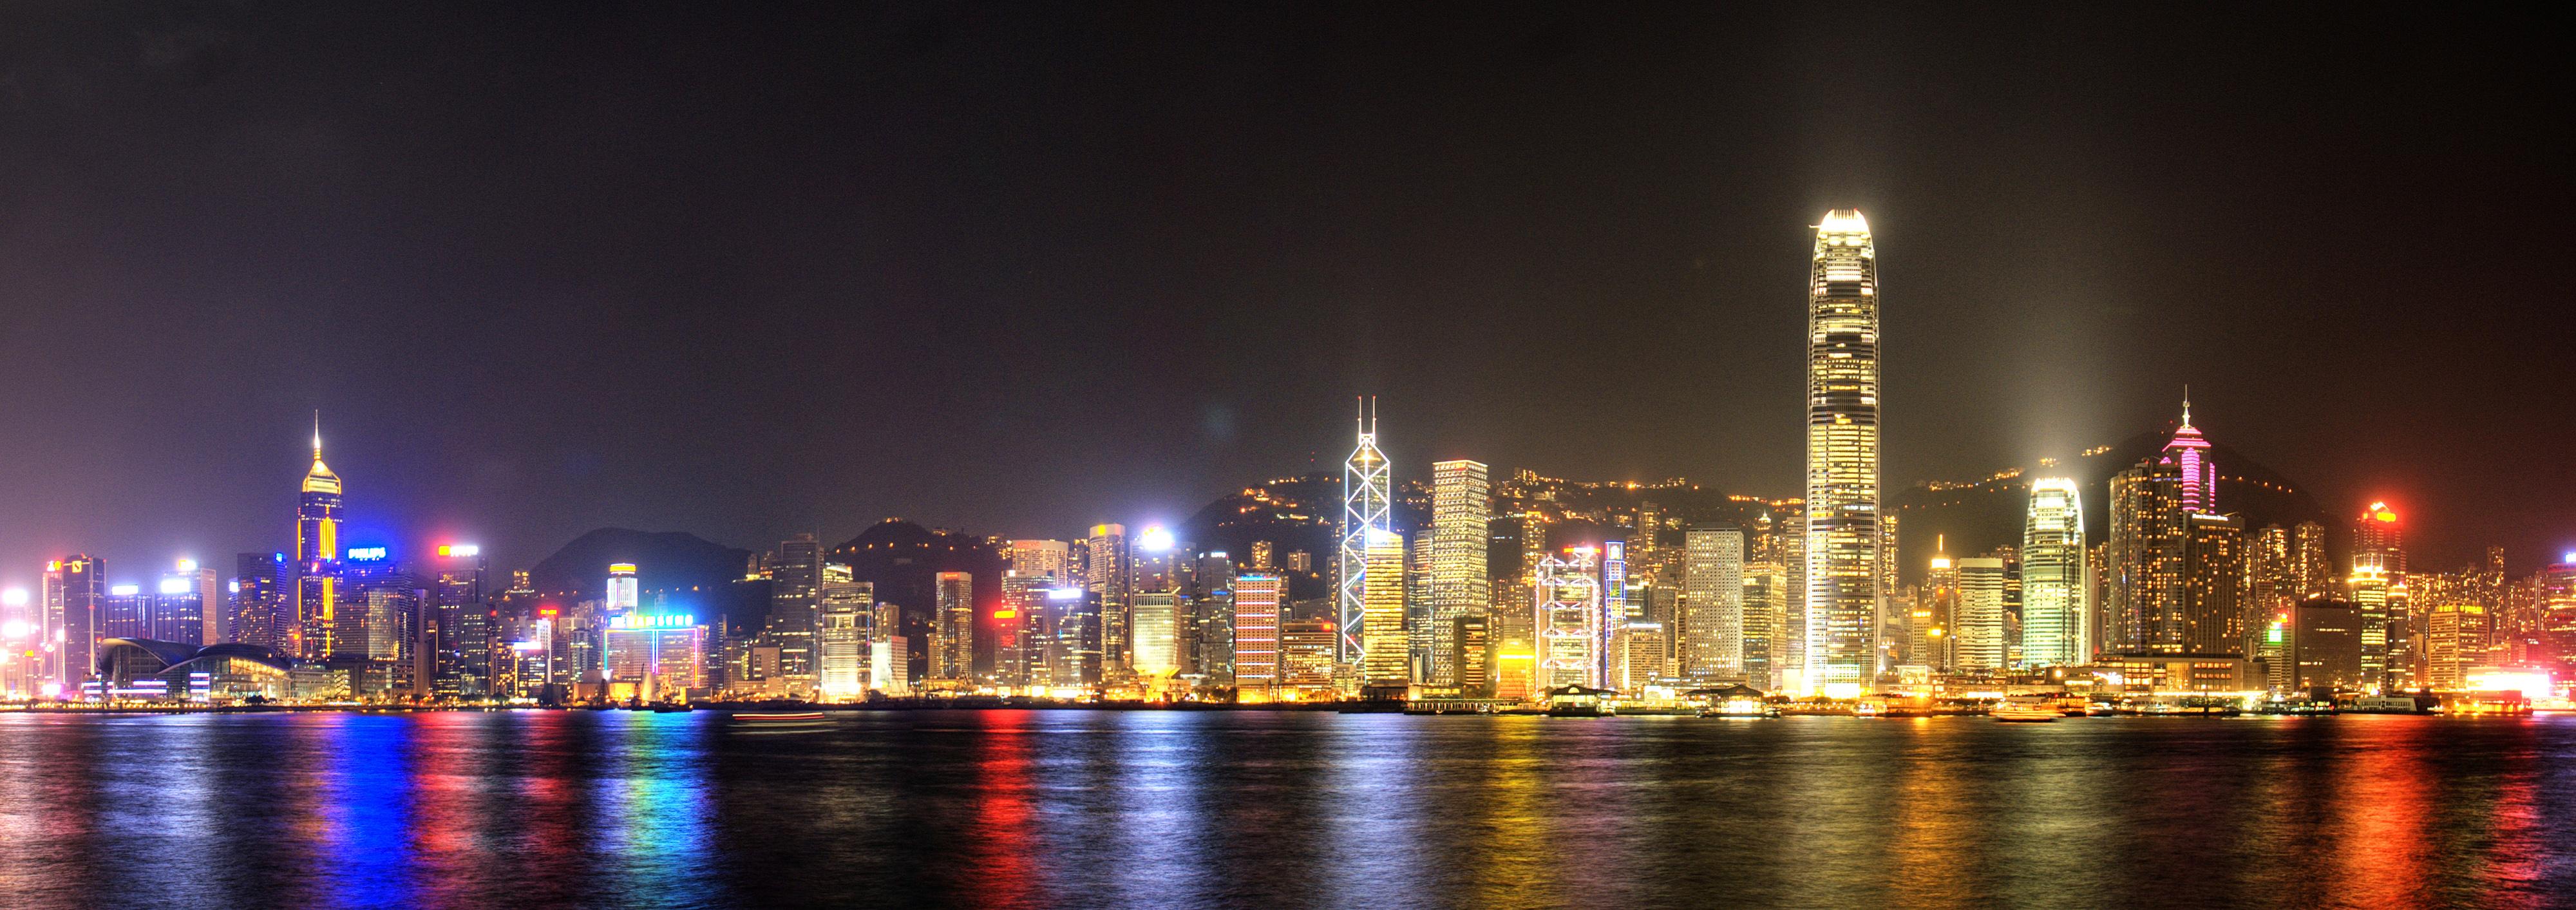 Panoramic_Hong_Kong_cityscape-_International_Finance_Centre,_Central_District._Hong_Kong,_China,_East_Asia